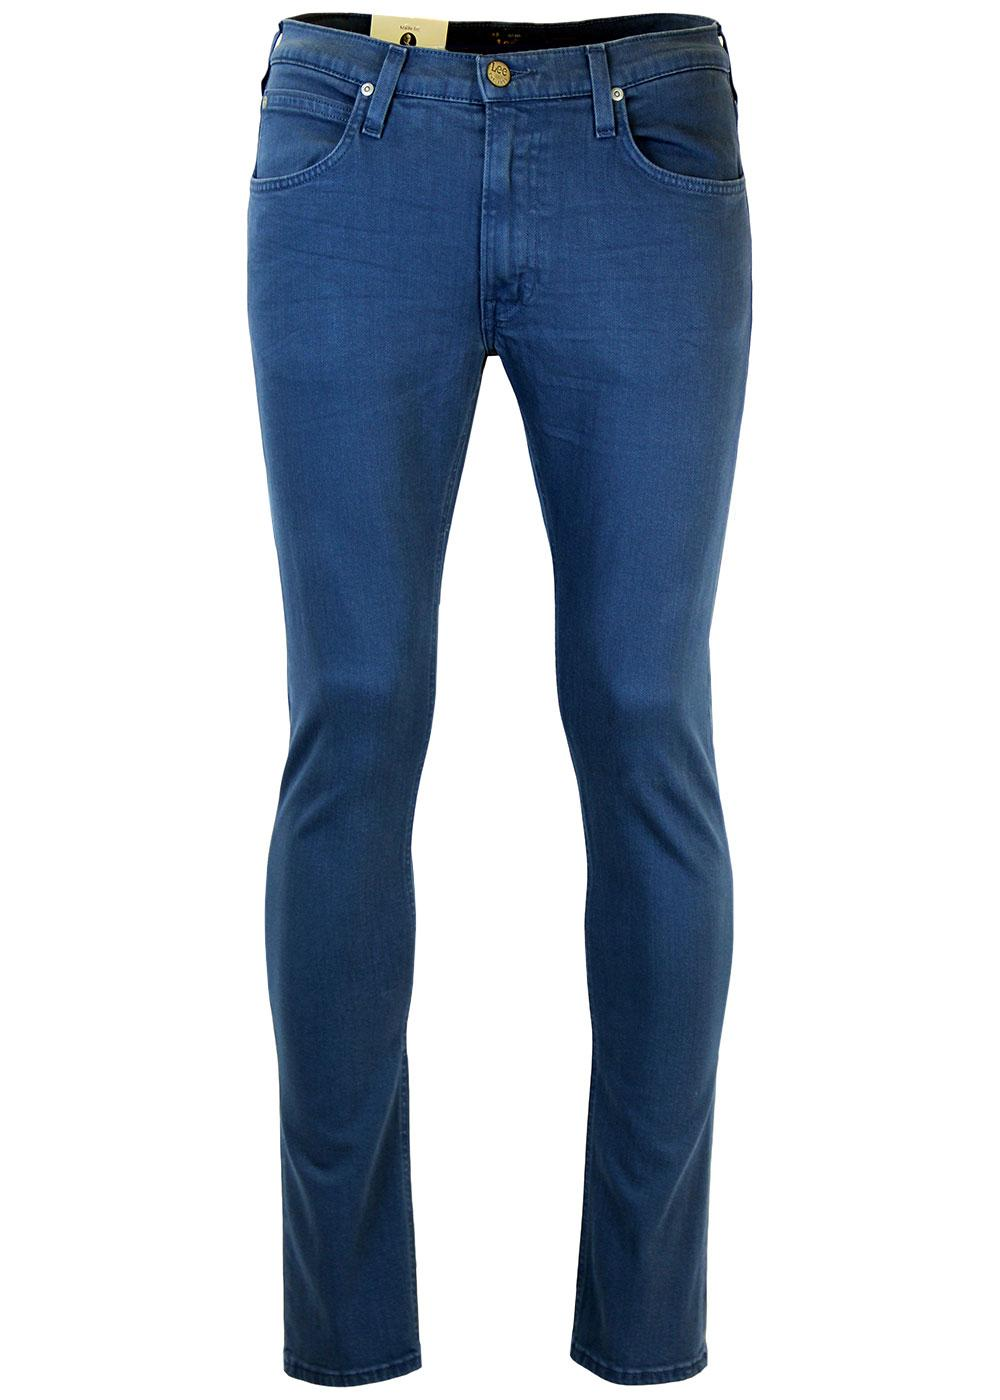 Luke LEE Retro Mod Slim Tapered Blue Denim Jeans